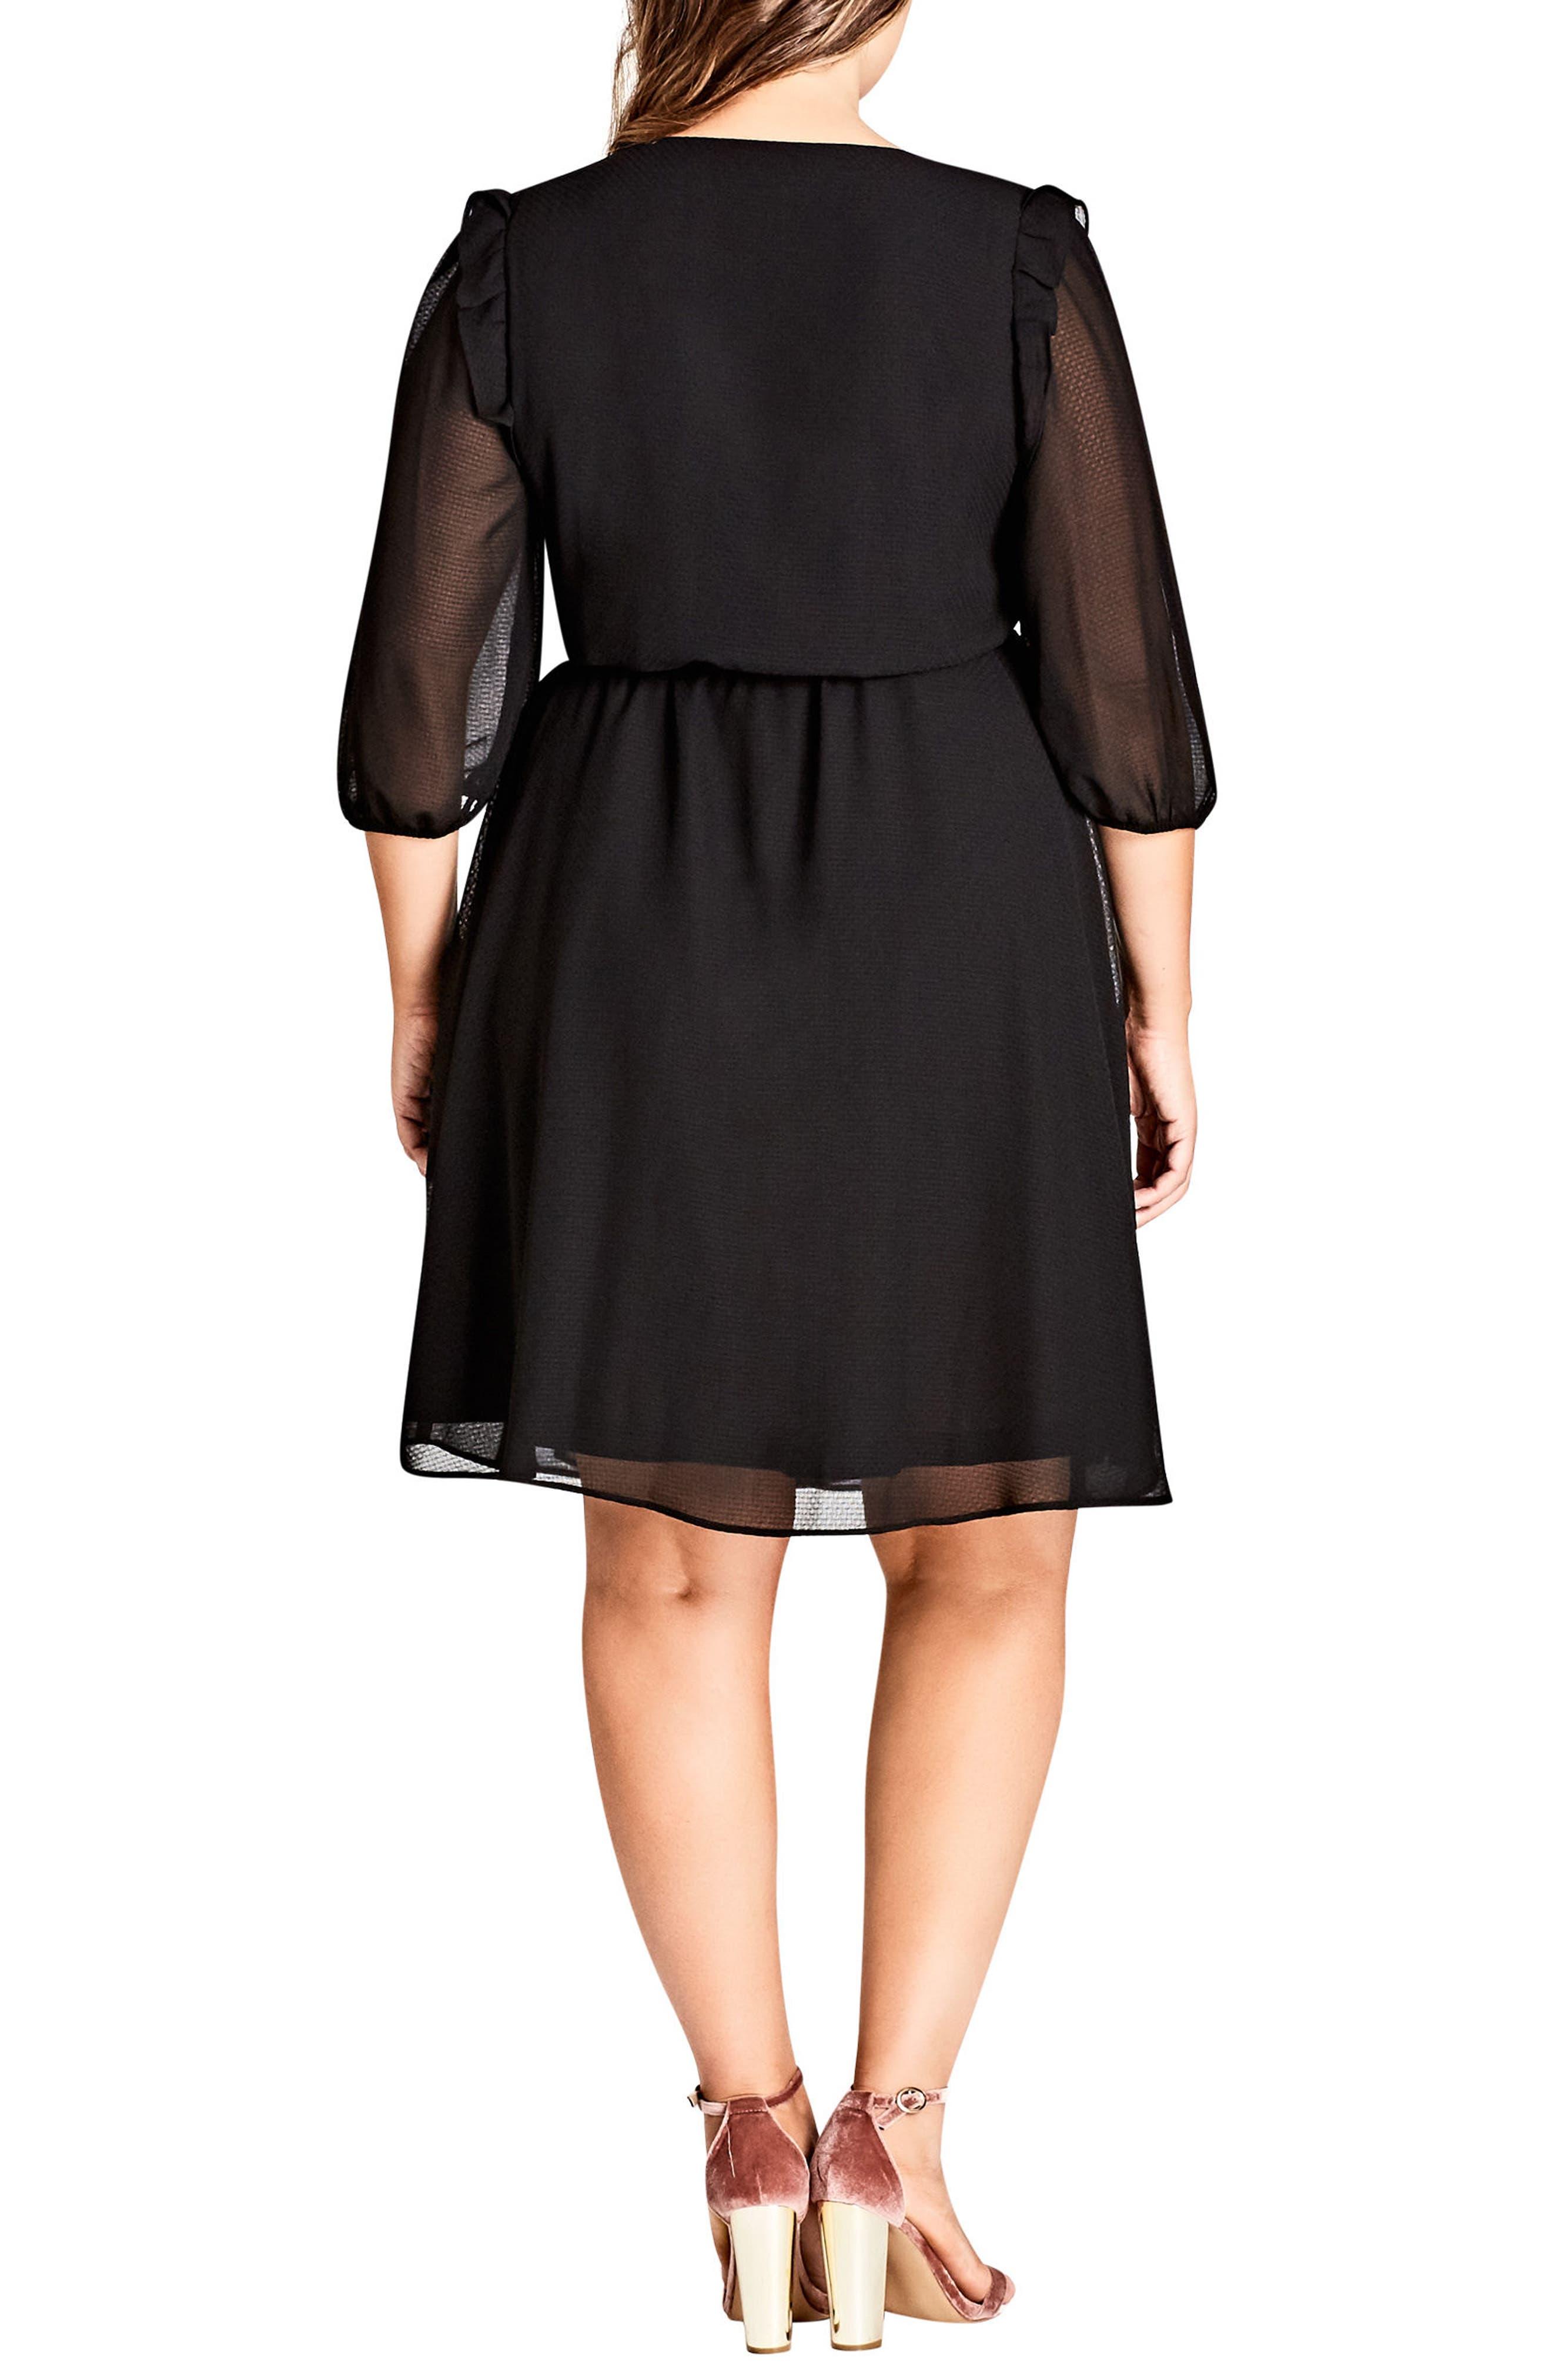 Simply So Wrap Dress,                             Alternate thumbnail 2, color,                             Black